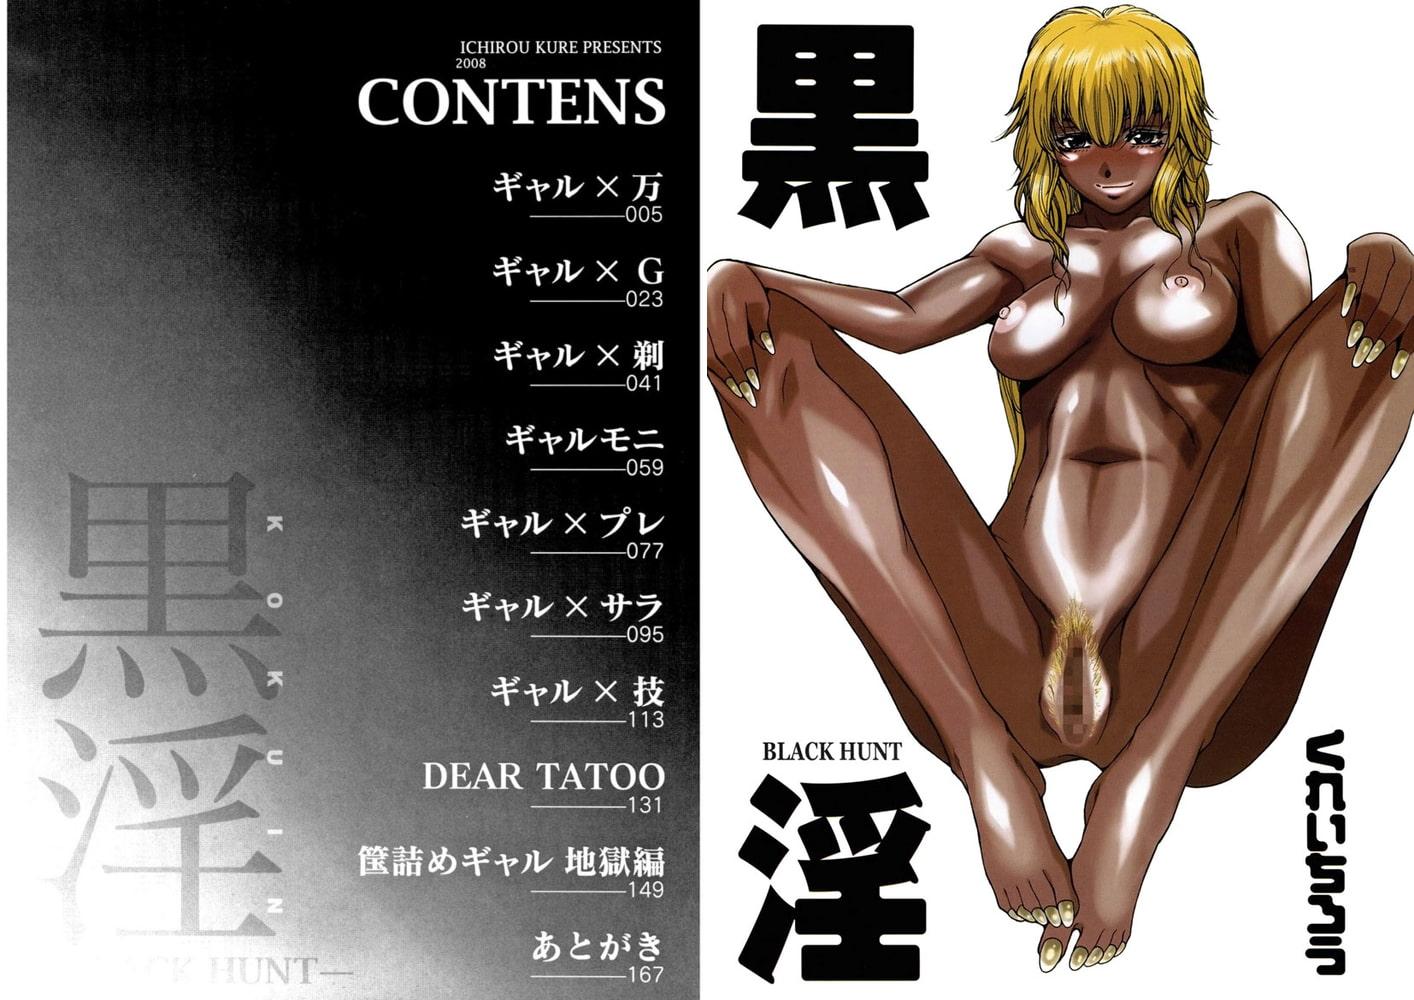 黒淫 -BLACK HUNT-